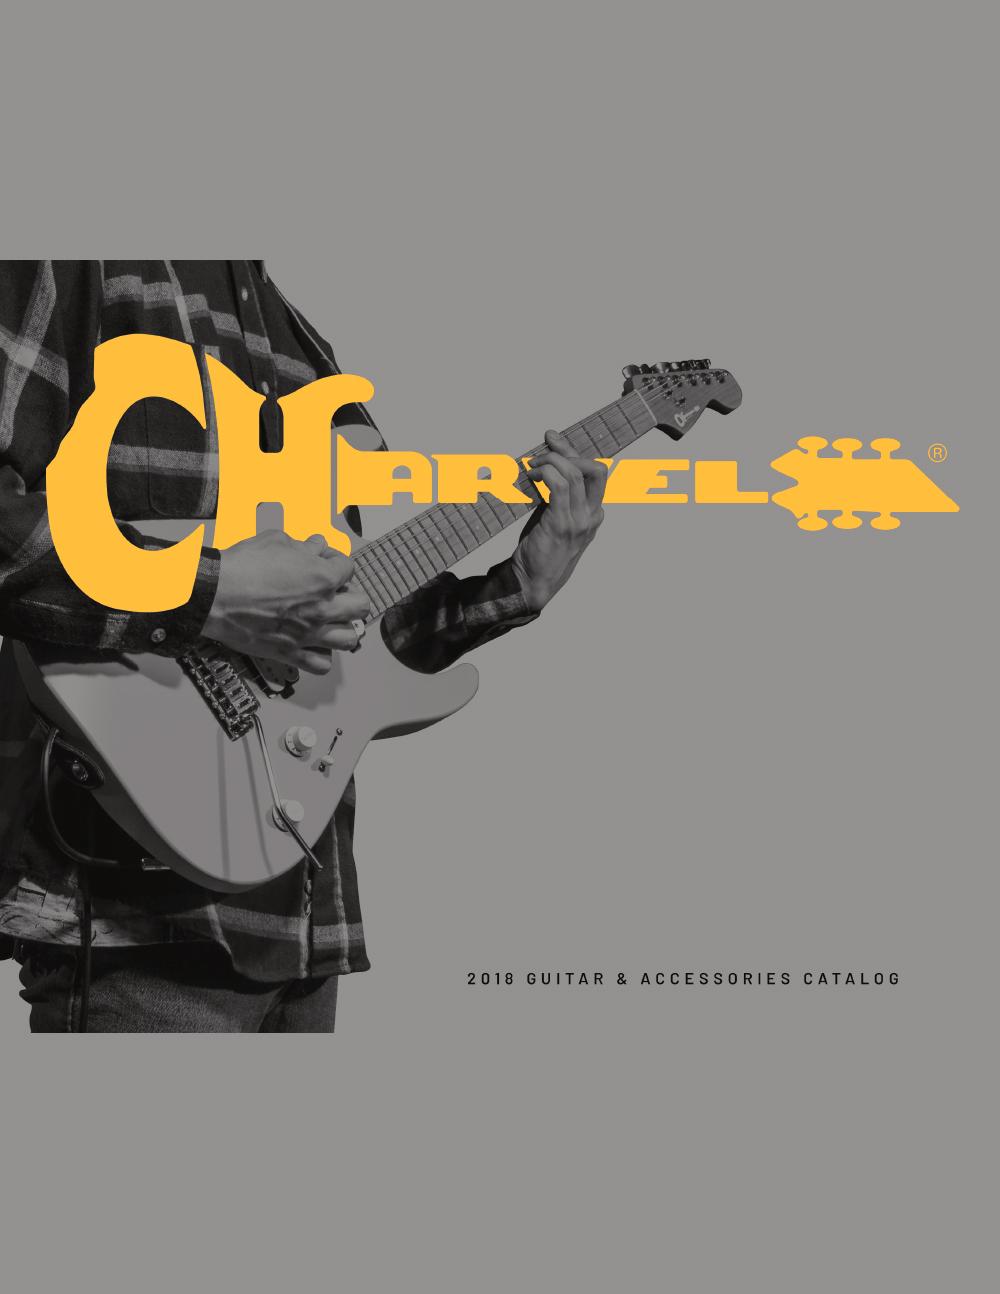 2018-Charvel-Catalog